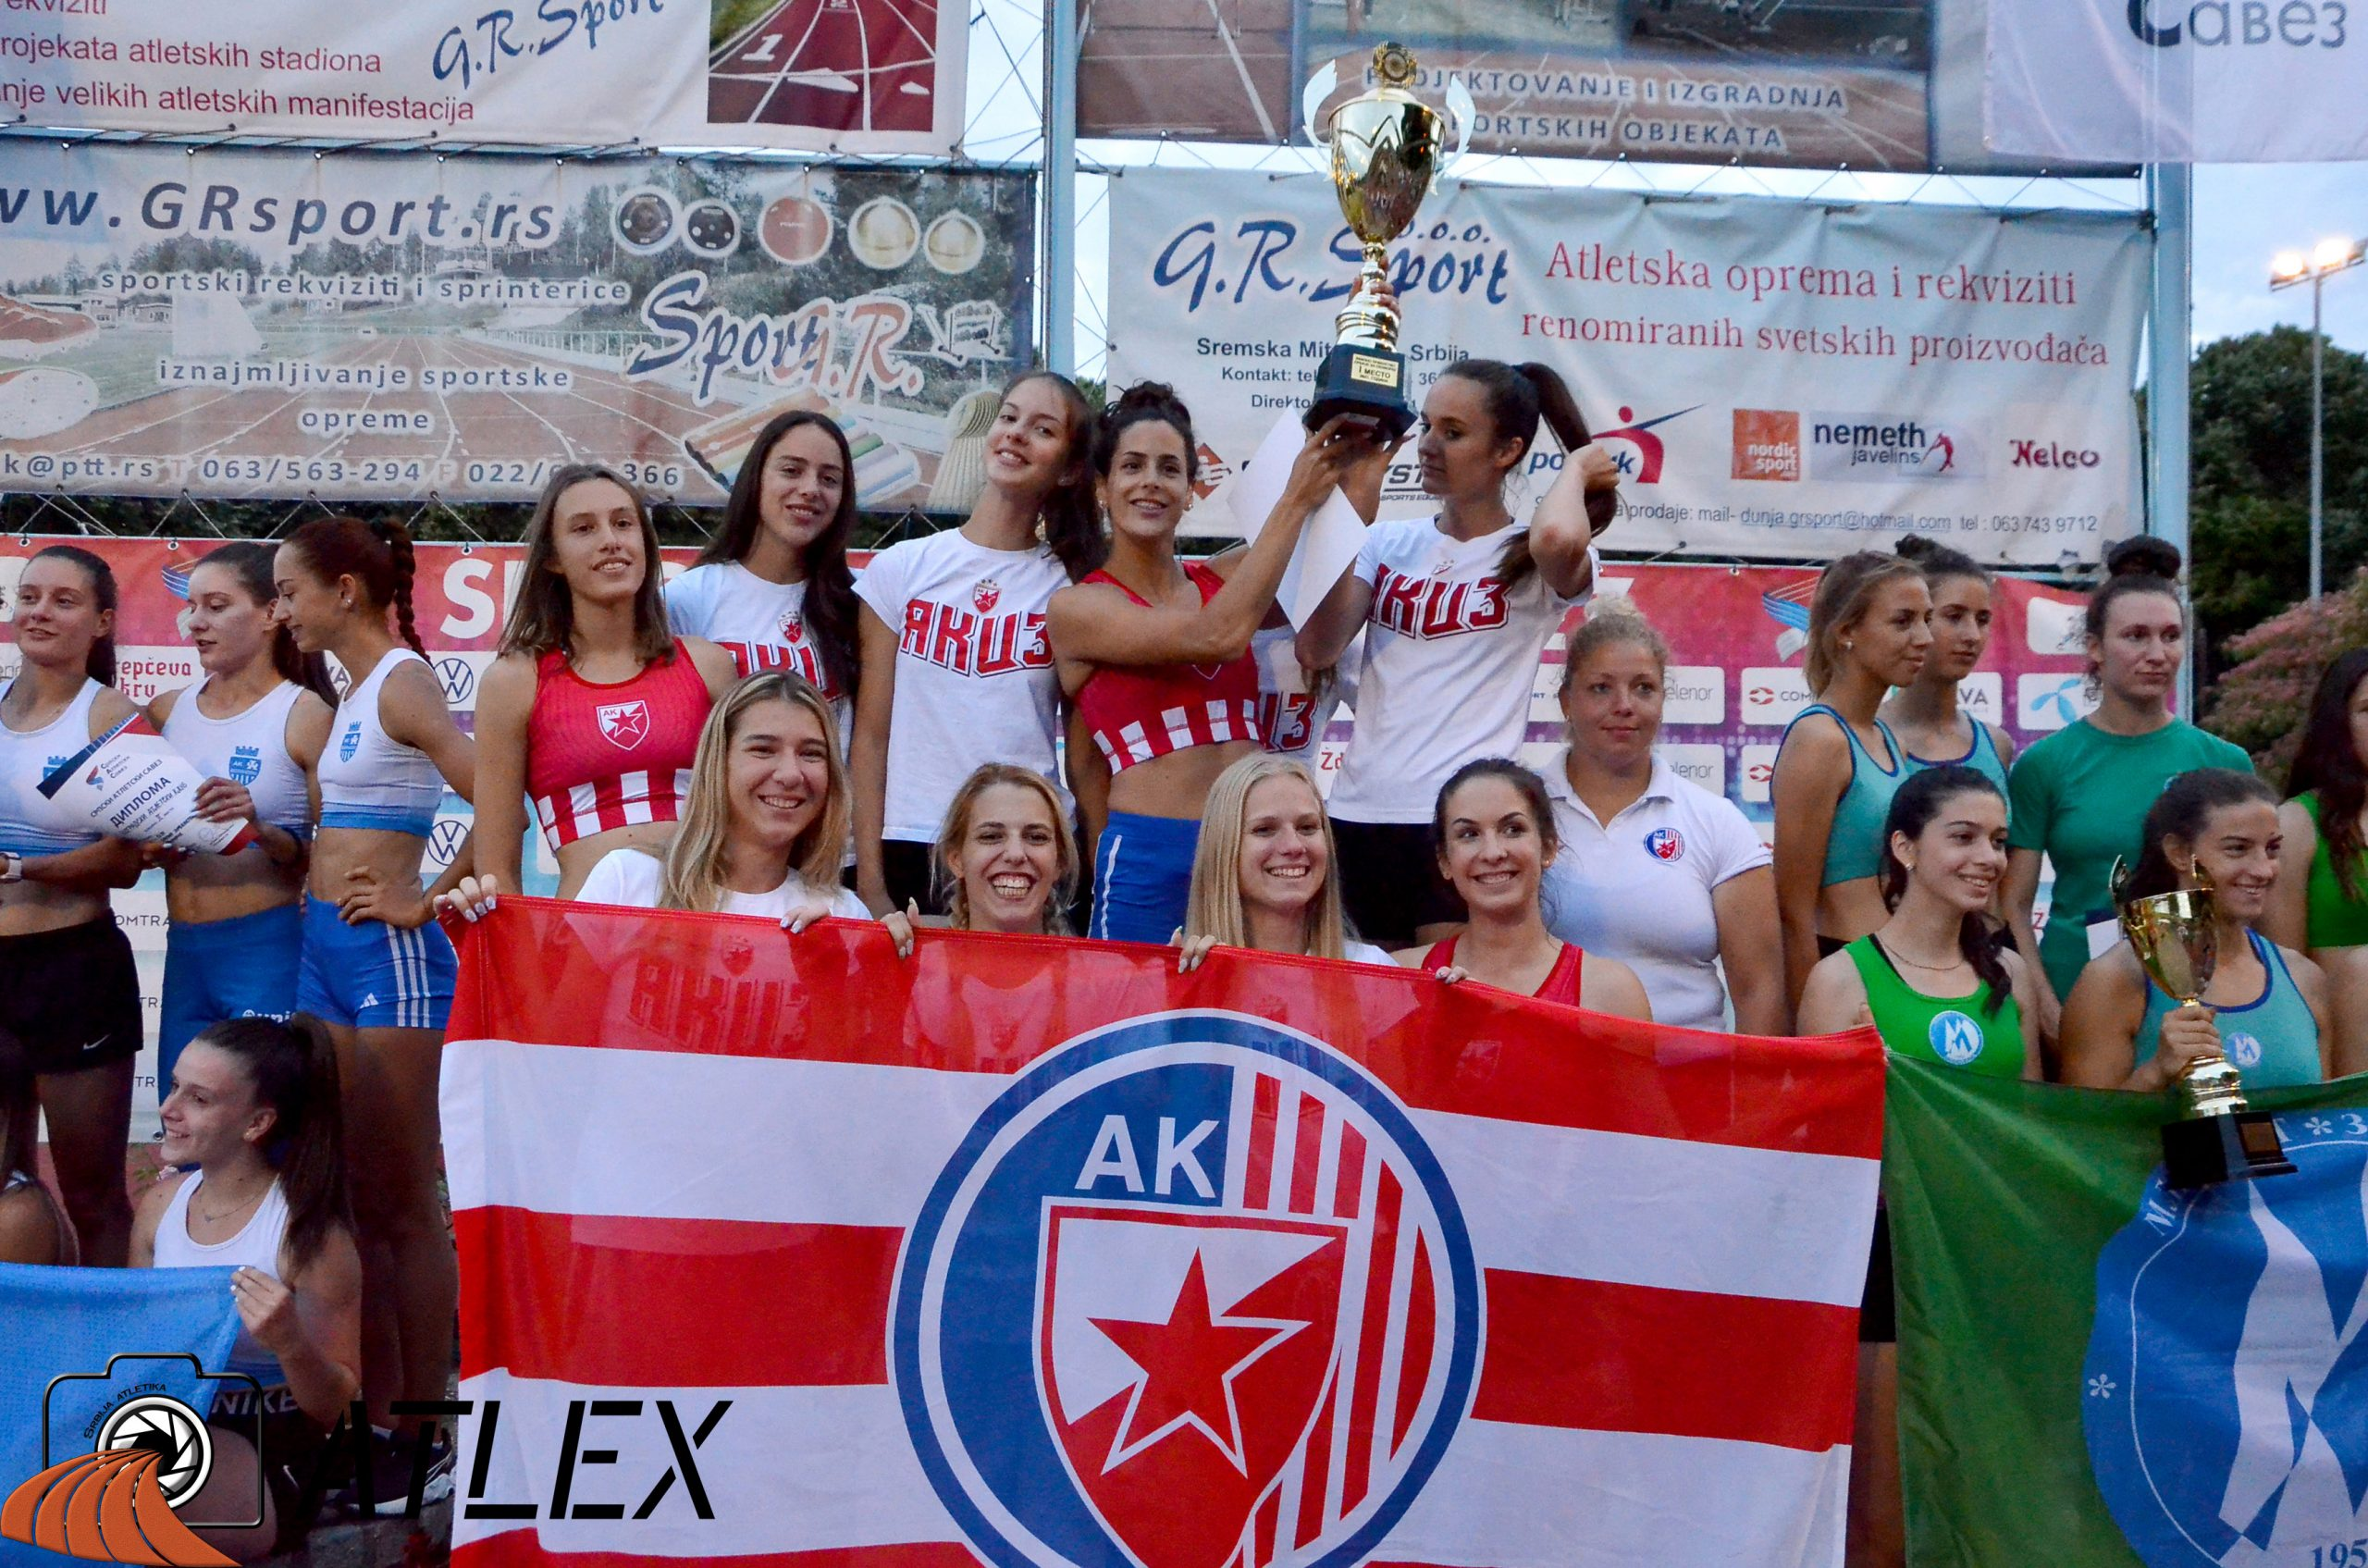 Ekipno prvenstvo Srbije 2021, šampionke - Crvena zvezda